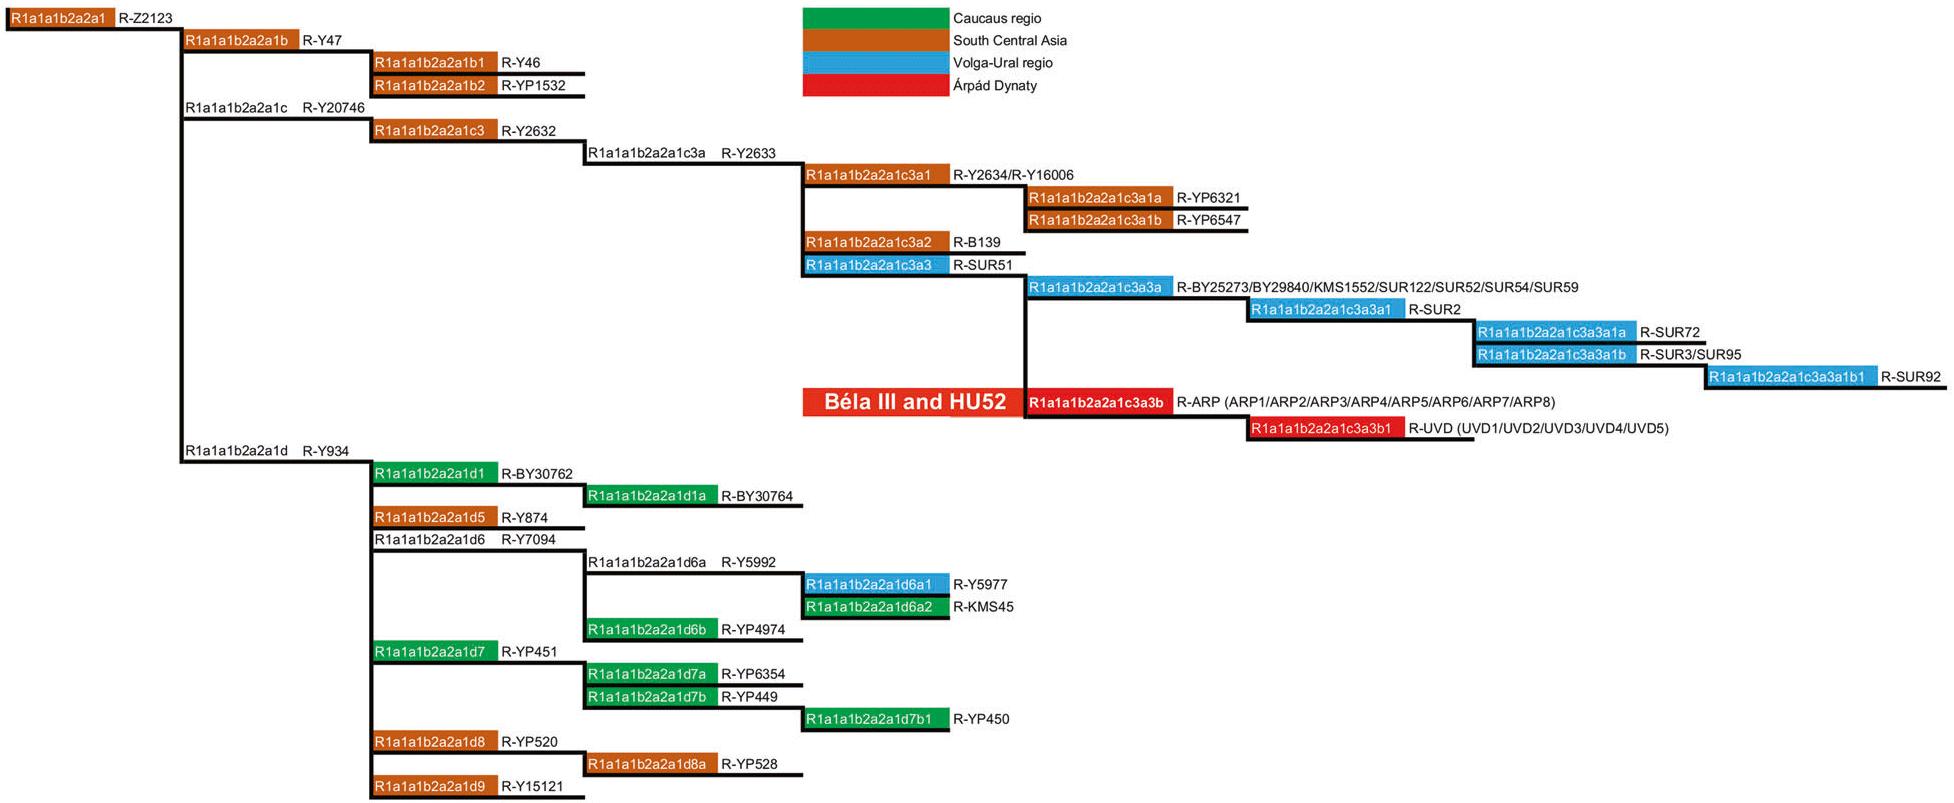 bela-arpad-dynasty-hu52-r1a-z2123-haplogroup